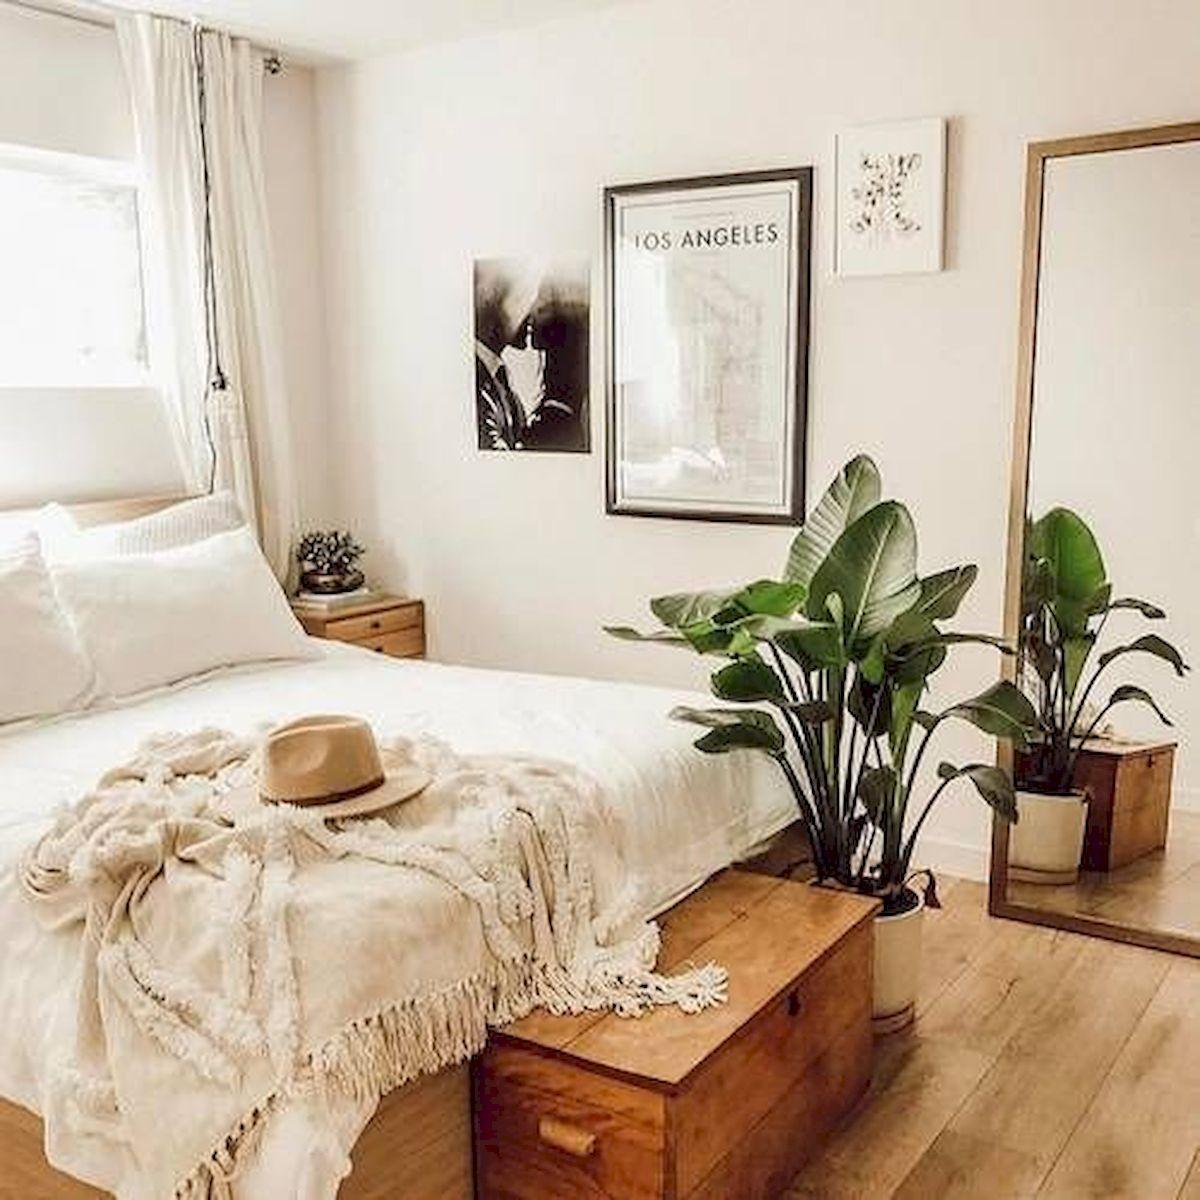 60 Beautiful Bedroom Decor and Design Ideas (20)